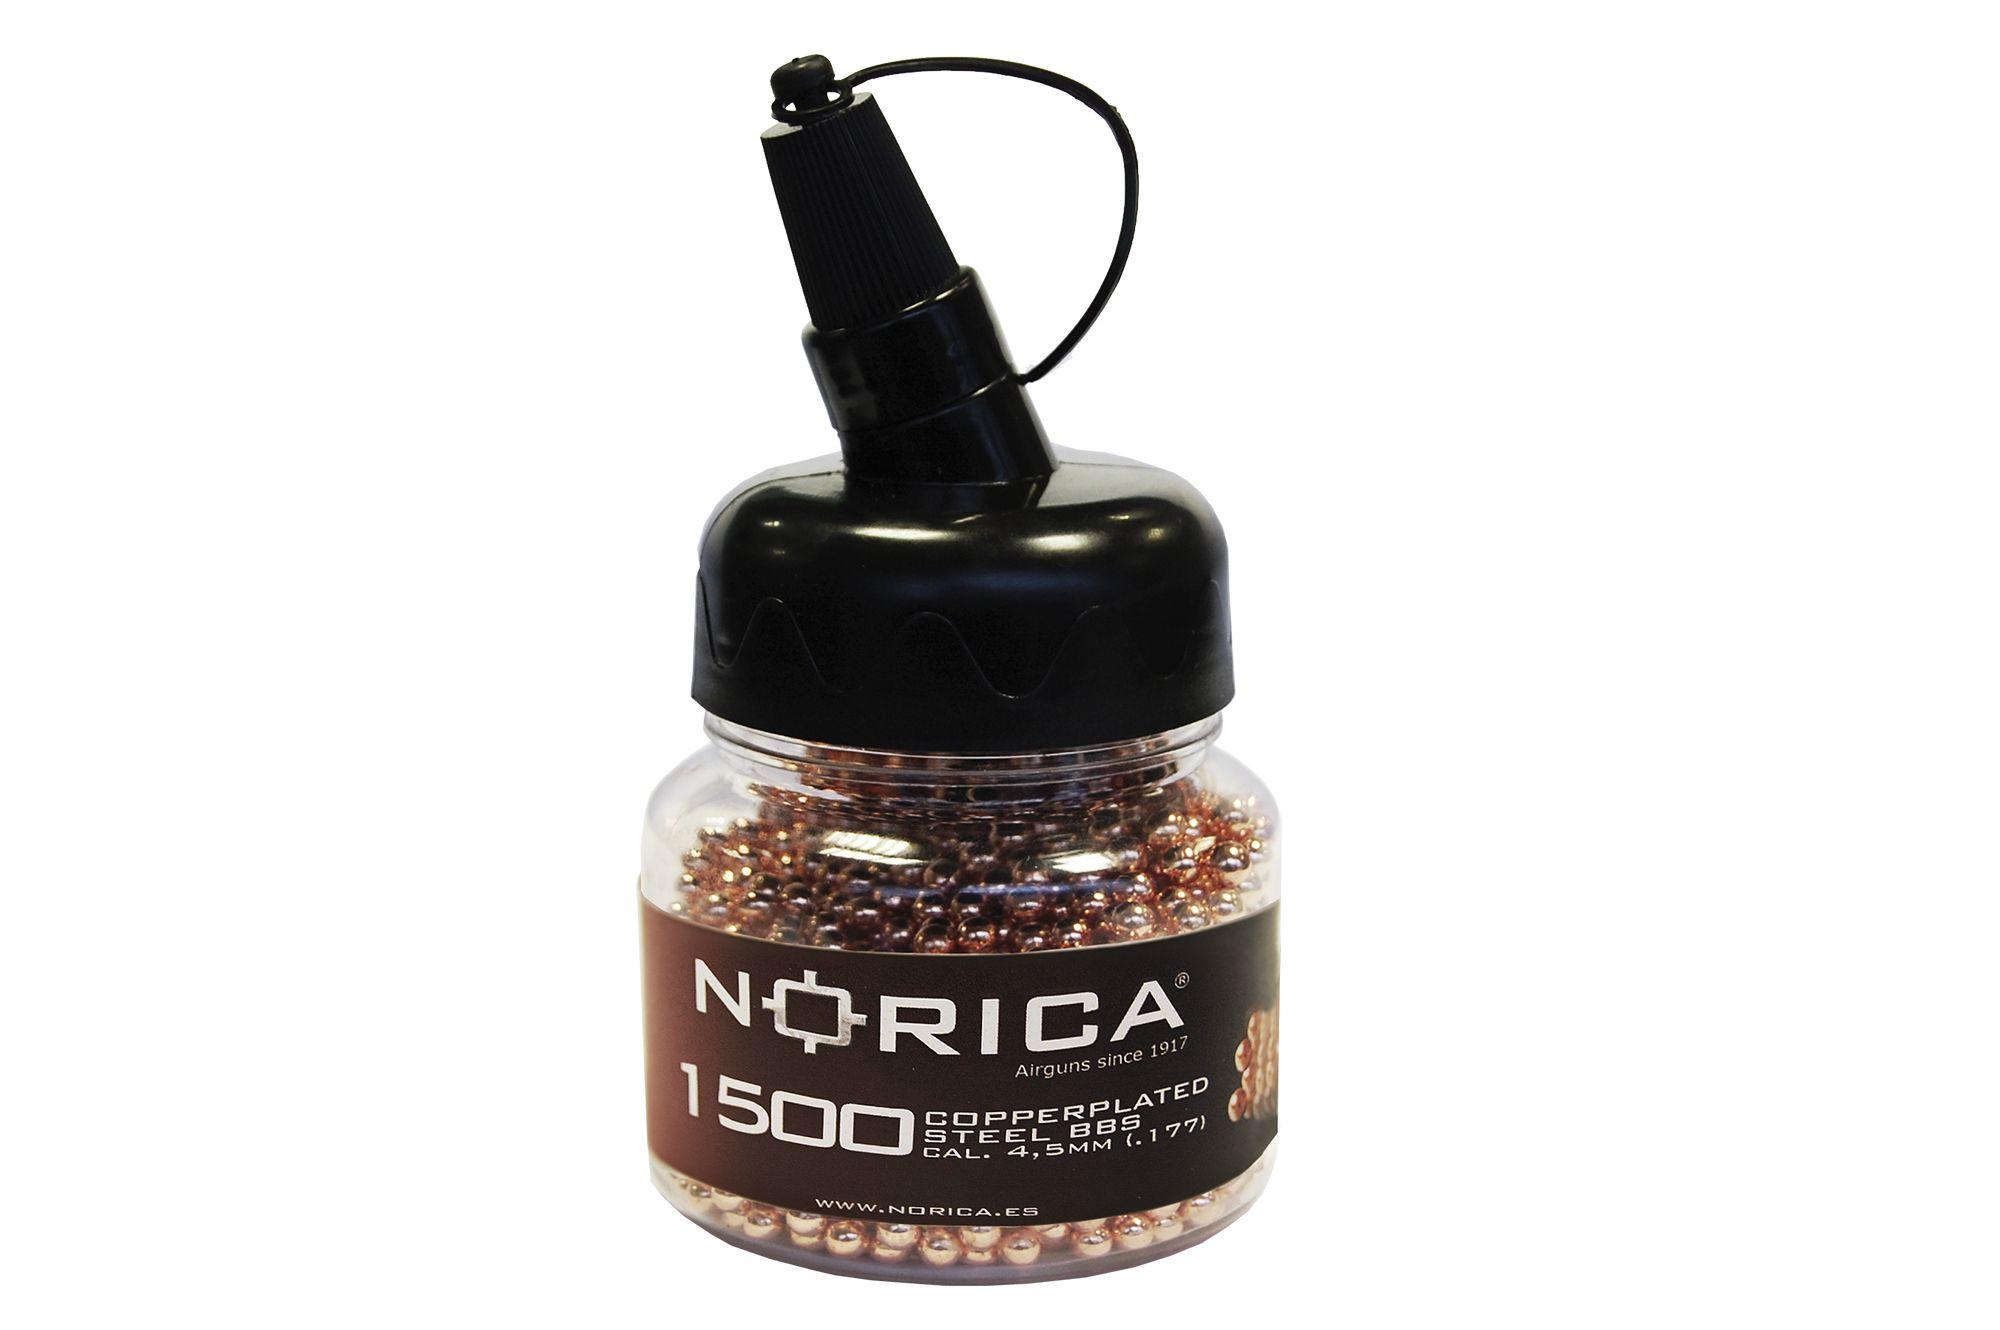 Norica Copper Plated Steel BBs .177 (4.5mm)